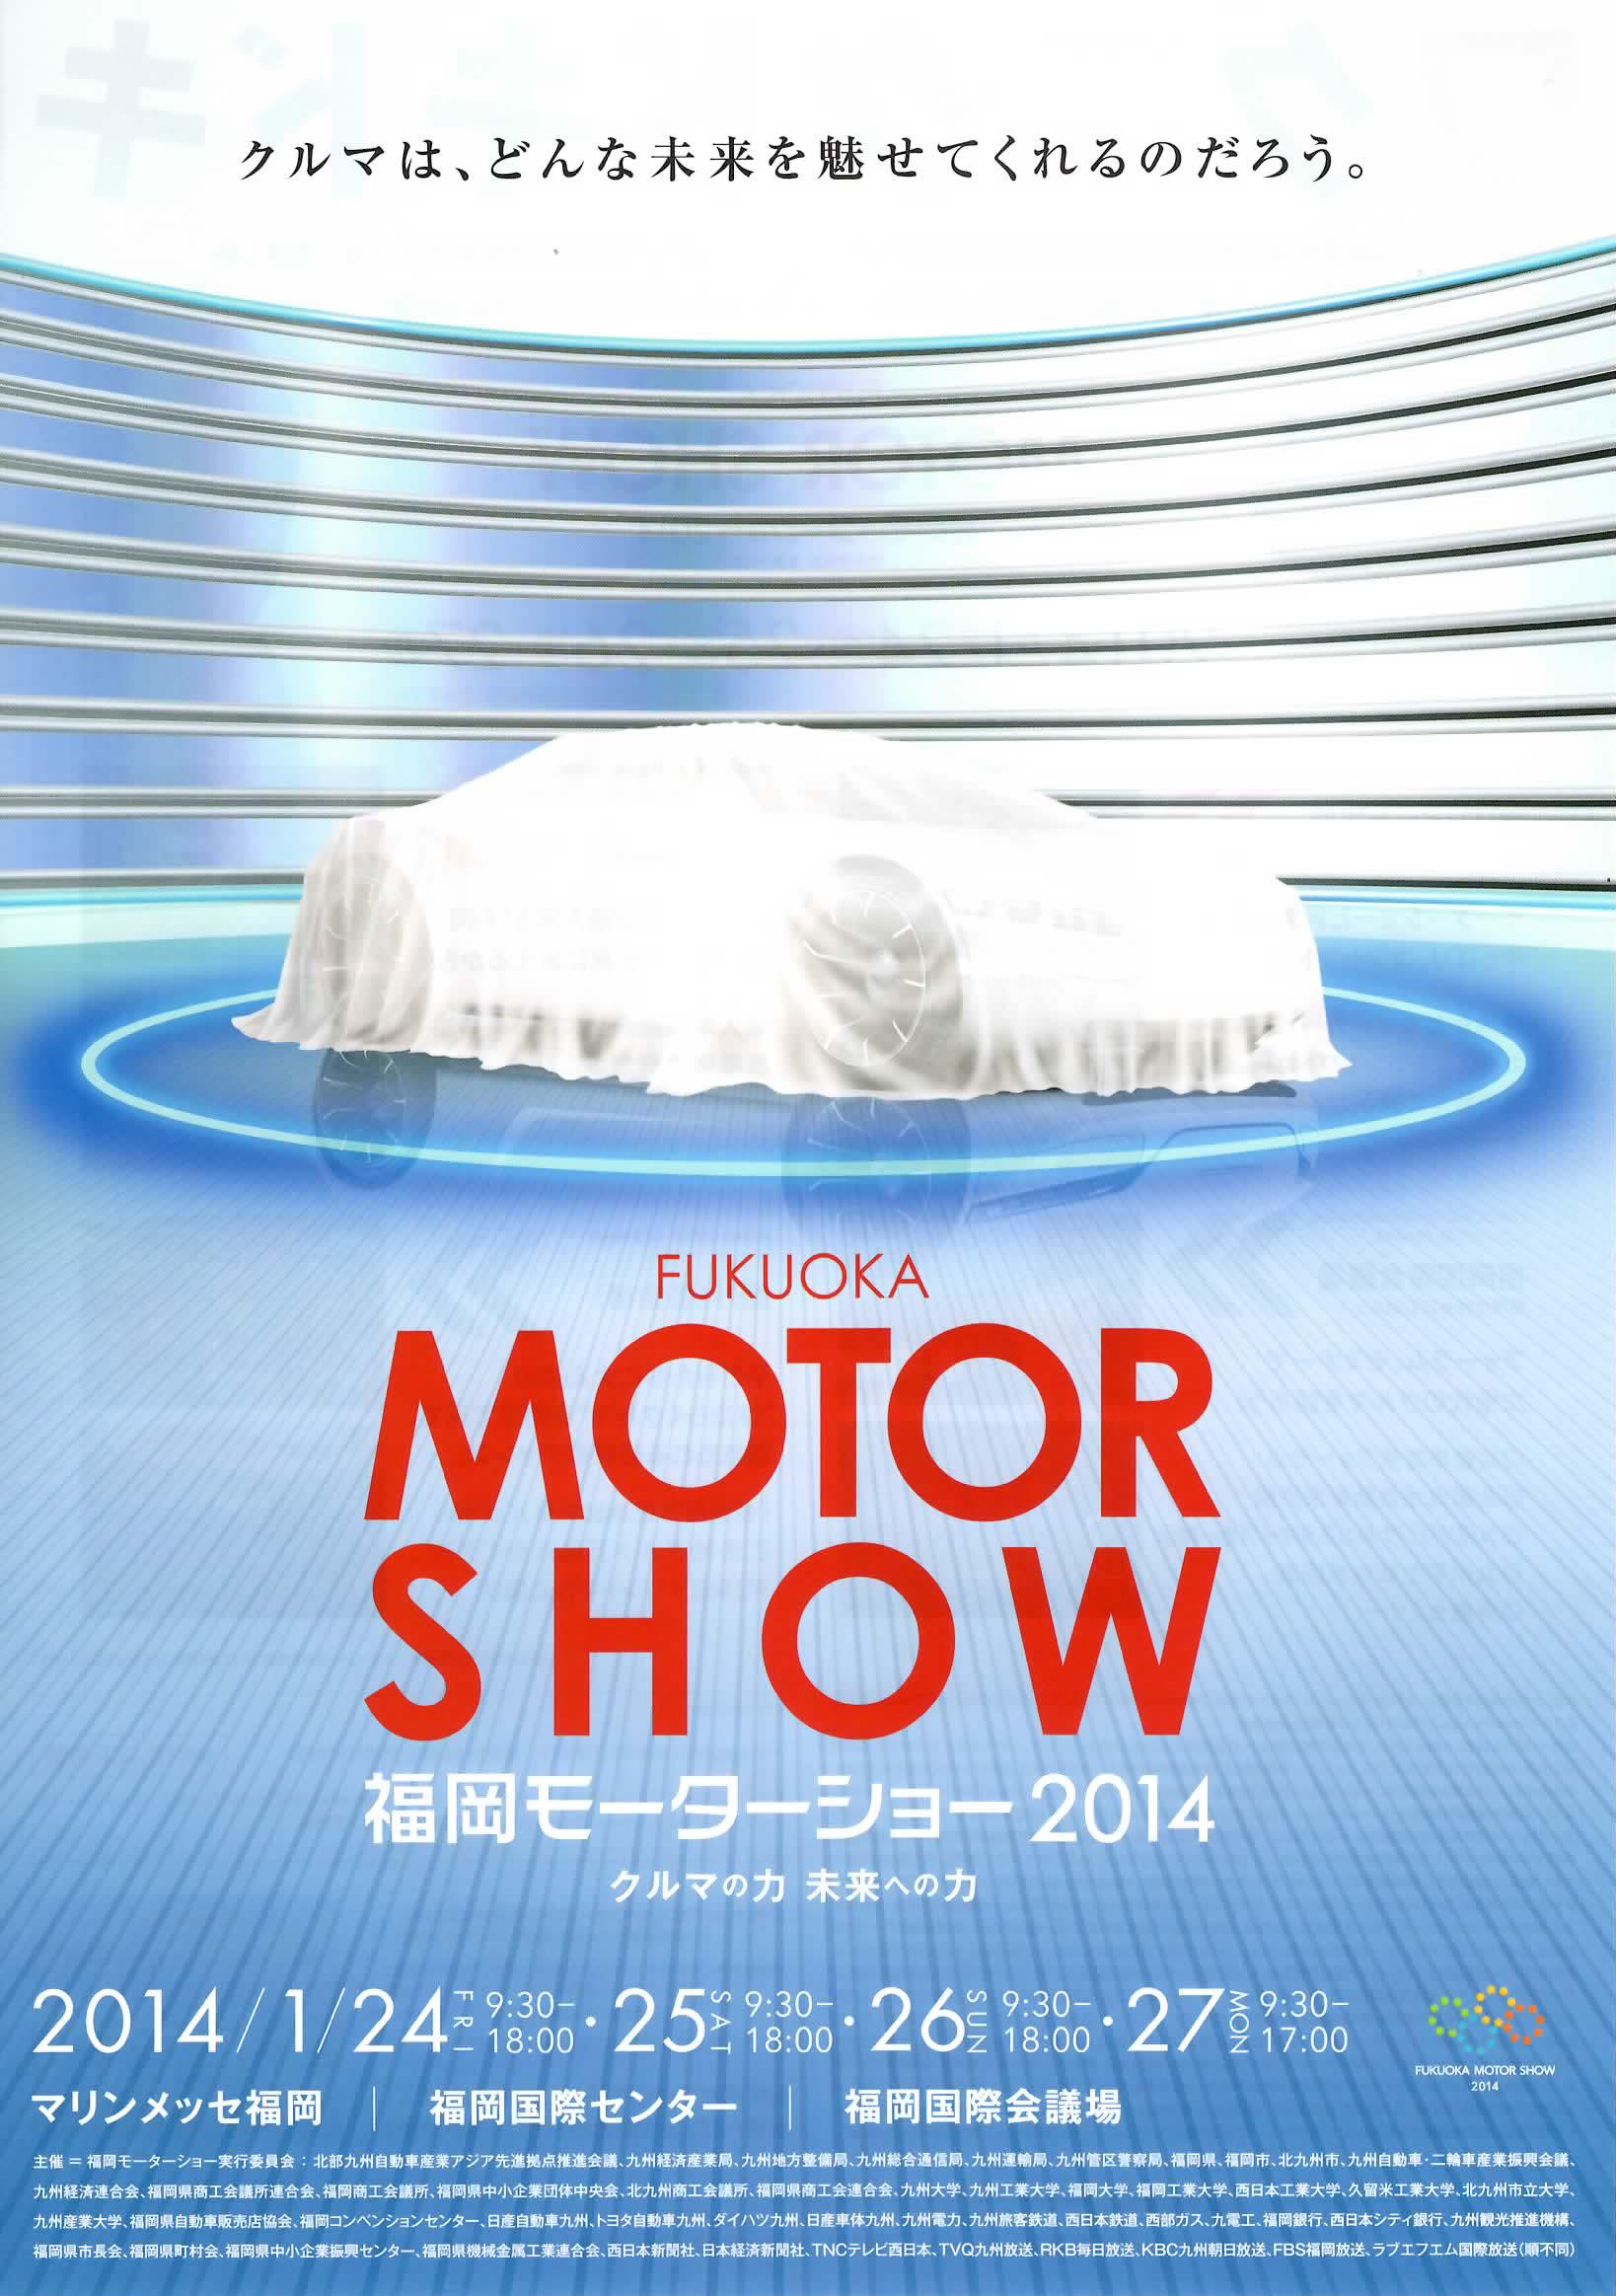 Fukuoka Motor Show 2014 Poster